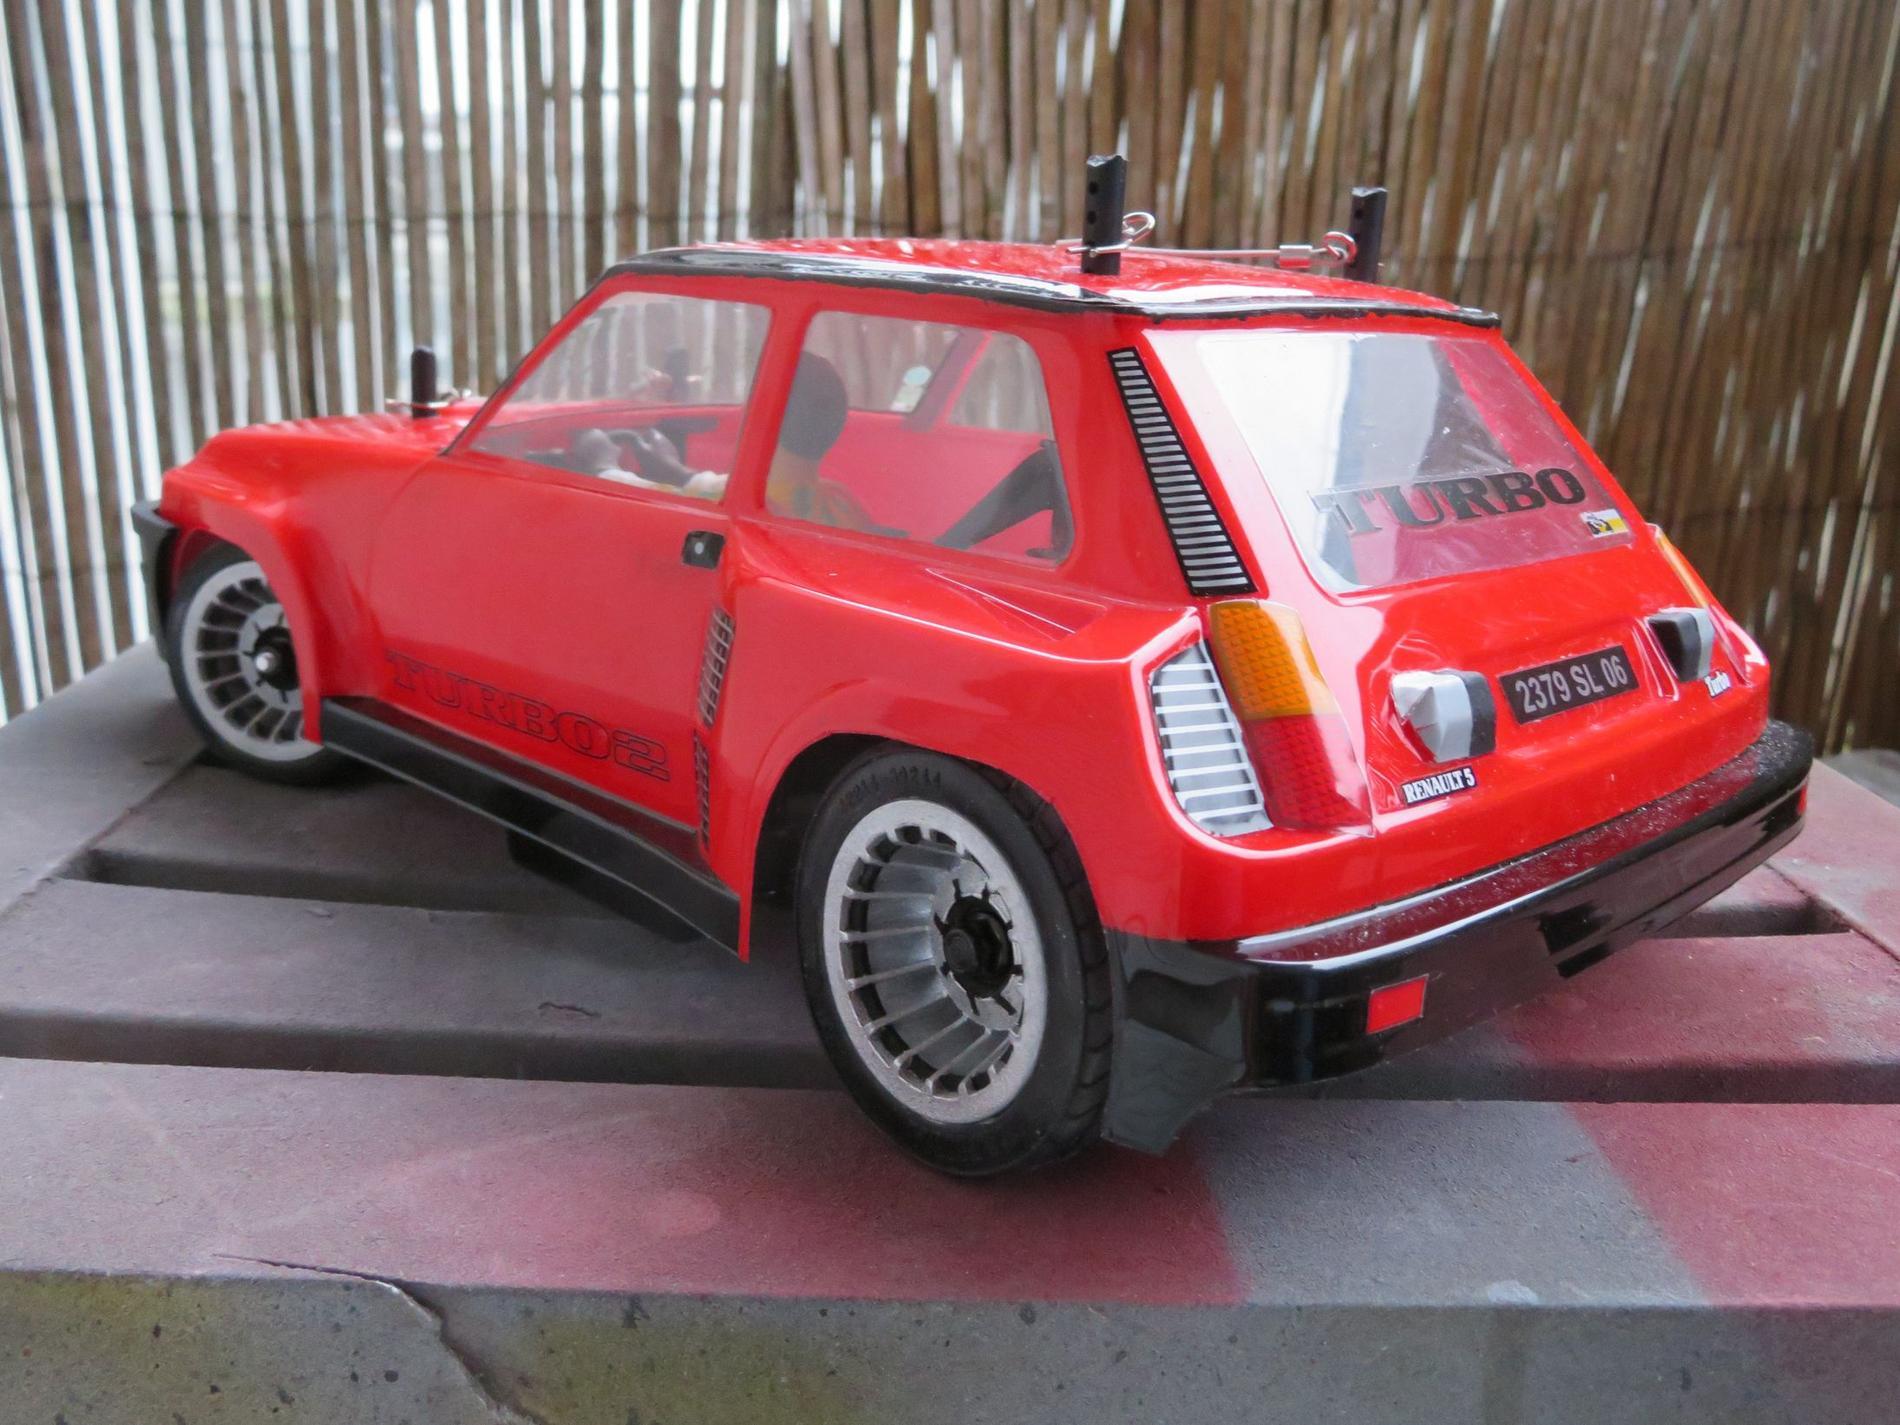 Tamiya Renault 5 Turbo - M08 Concept 1cddc0eea8bec33fbeb3e3d6a6a31e8e